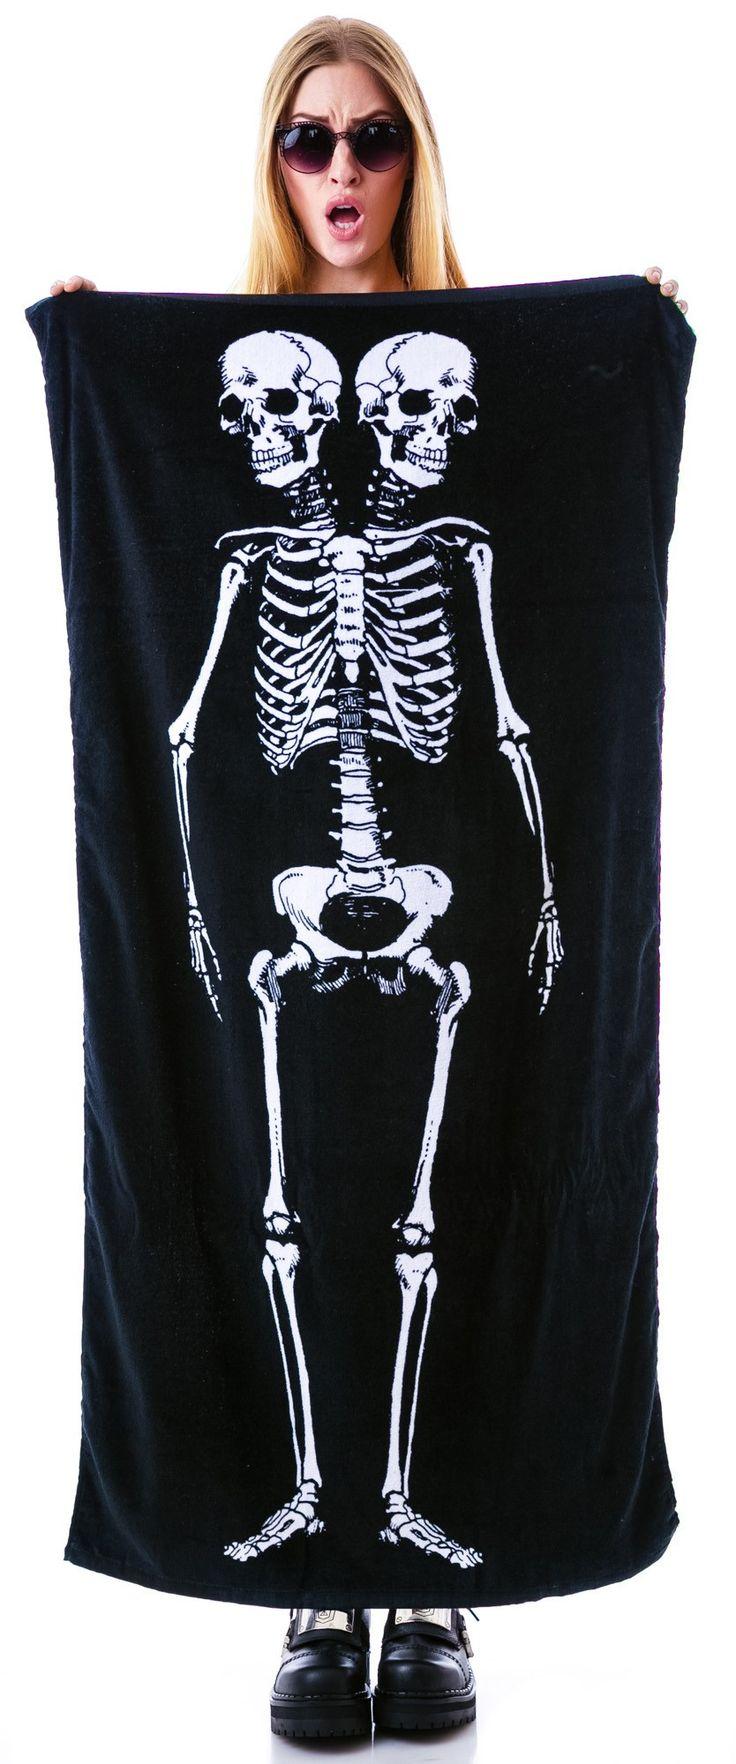 Sourpuss Clothing Skeleton Beach Towel | Dolls Kill | I NEED THIS!!!!! <3